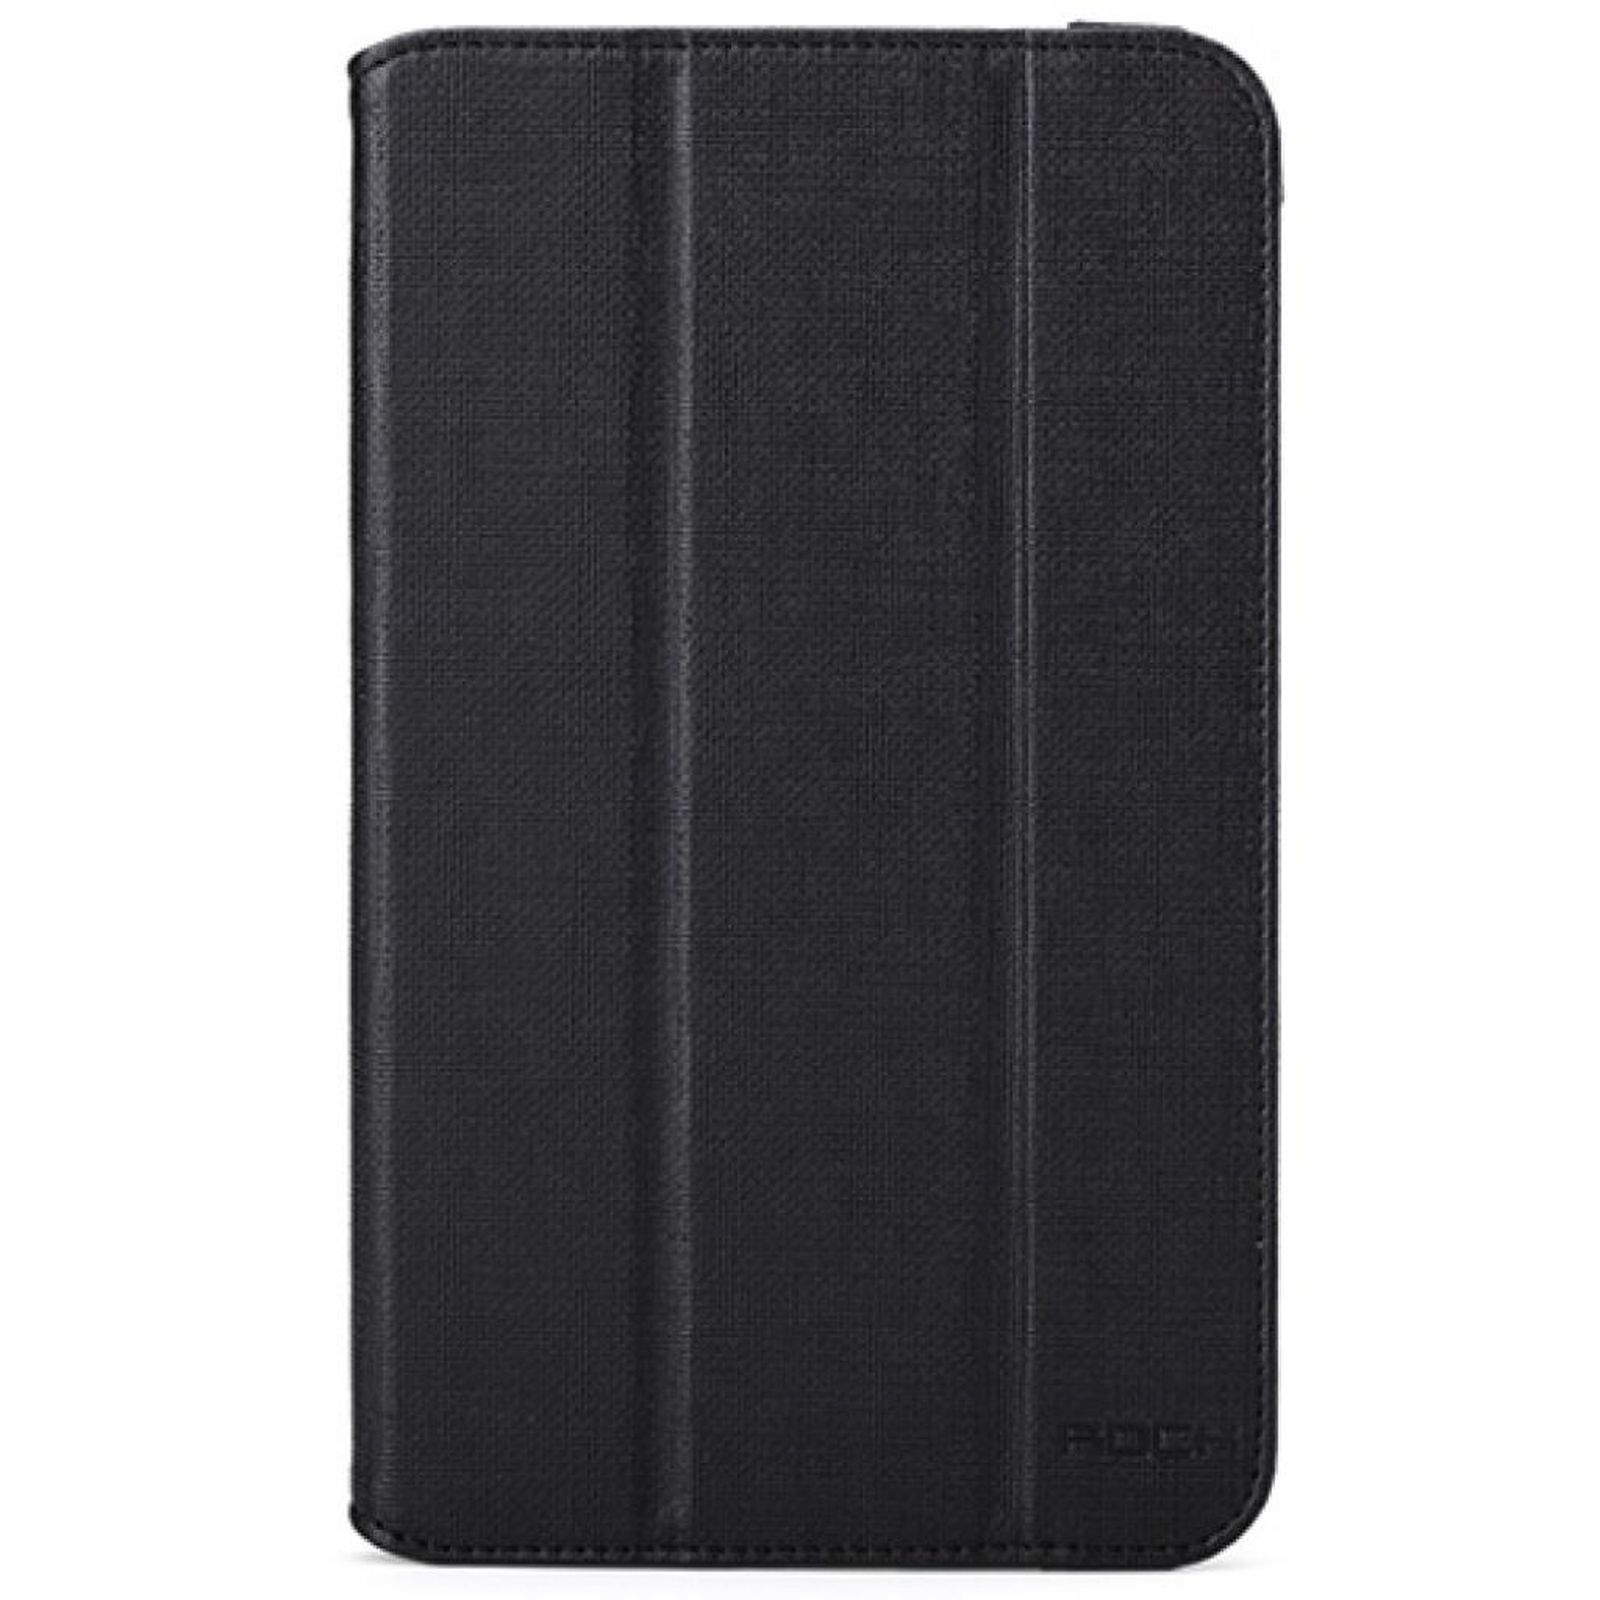 Чехол для планшета Rock Samsung Galaxy Tab3 8.0 T3100 Flexible series black (T3100-40148)